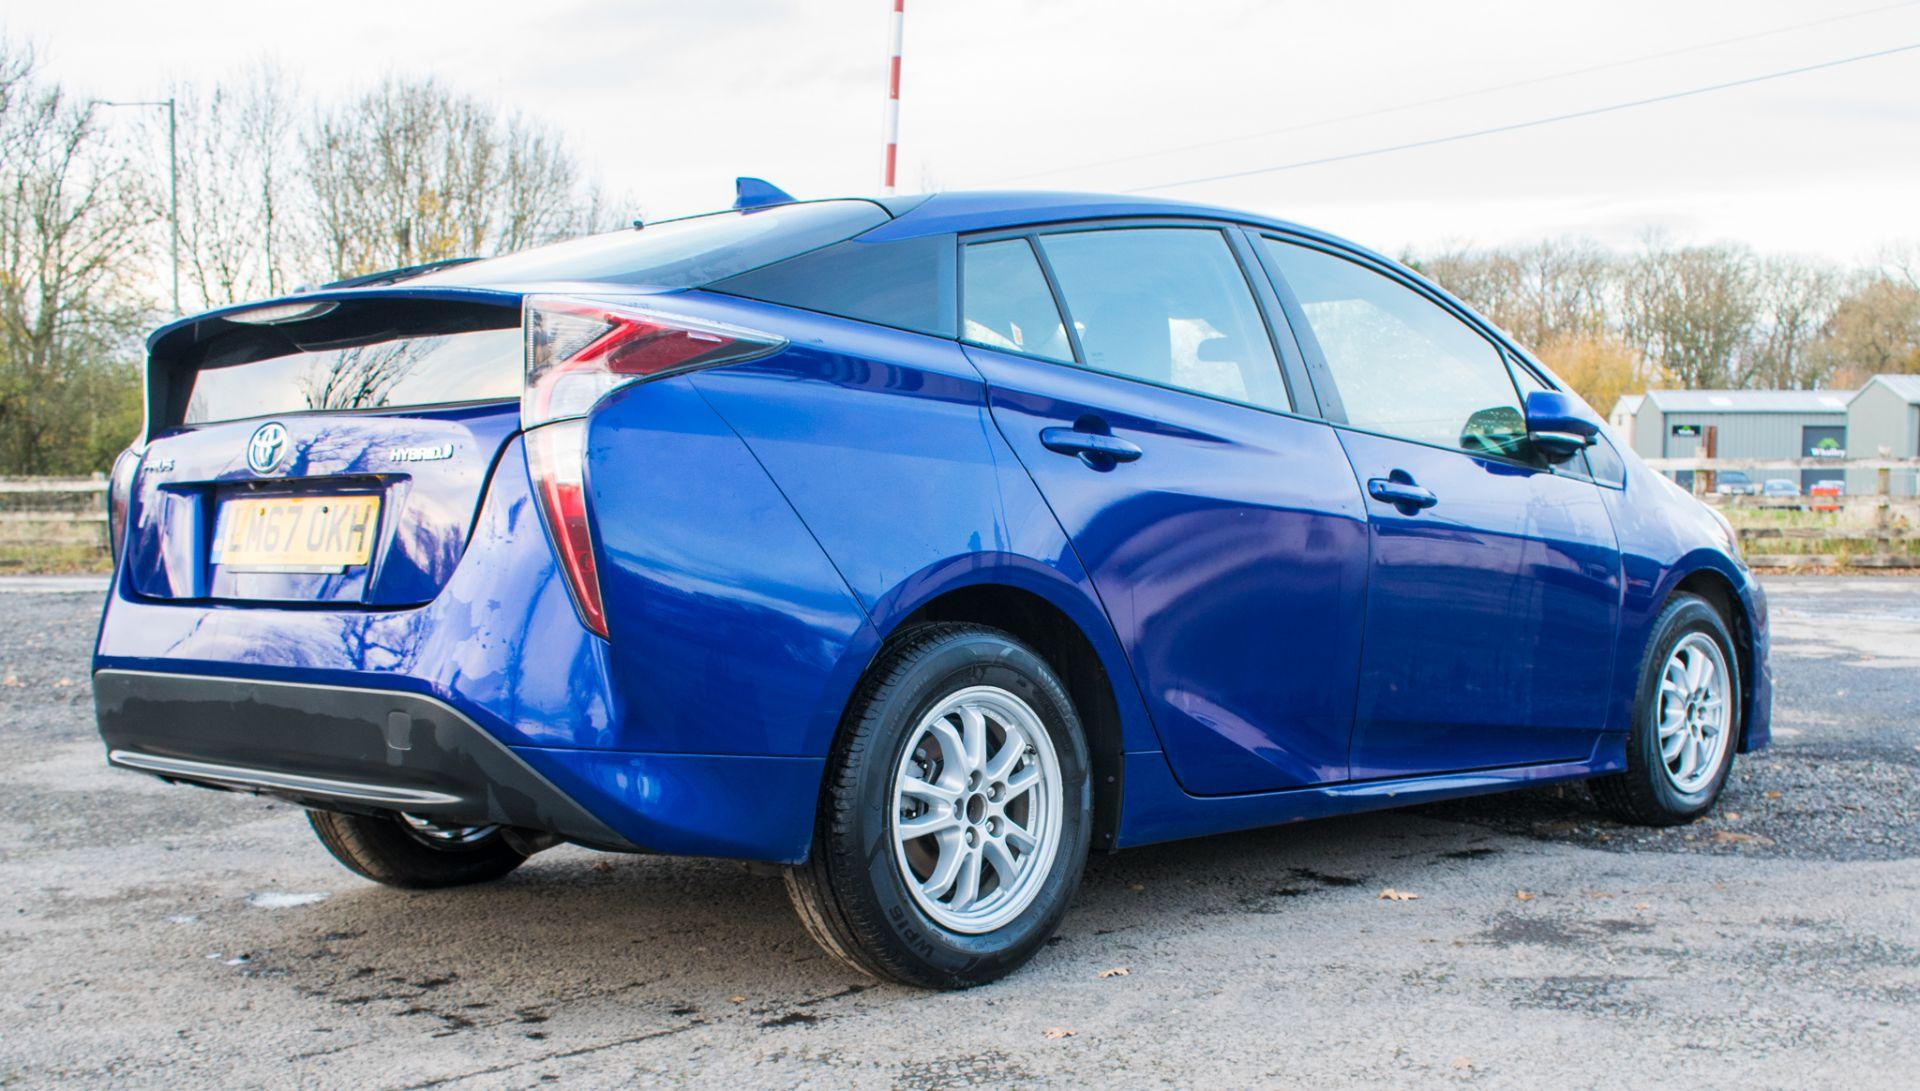 ToyotaPrius ActiveHybrid Electric 5 doorHatchback  Registration Number: LM67 OKH Date of First - Image 3 of 17